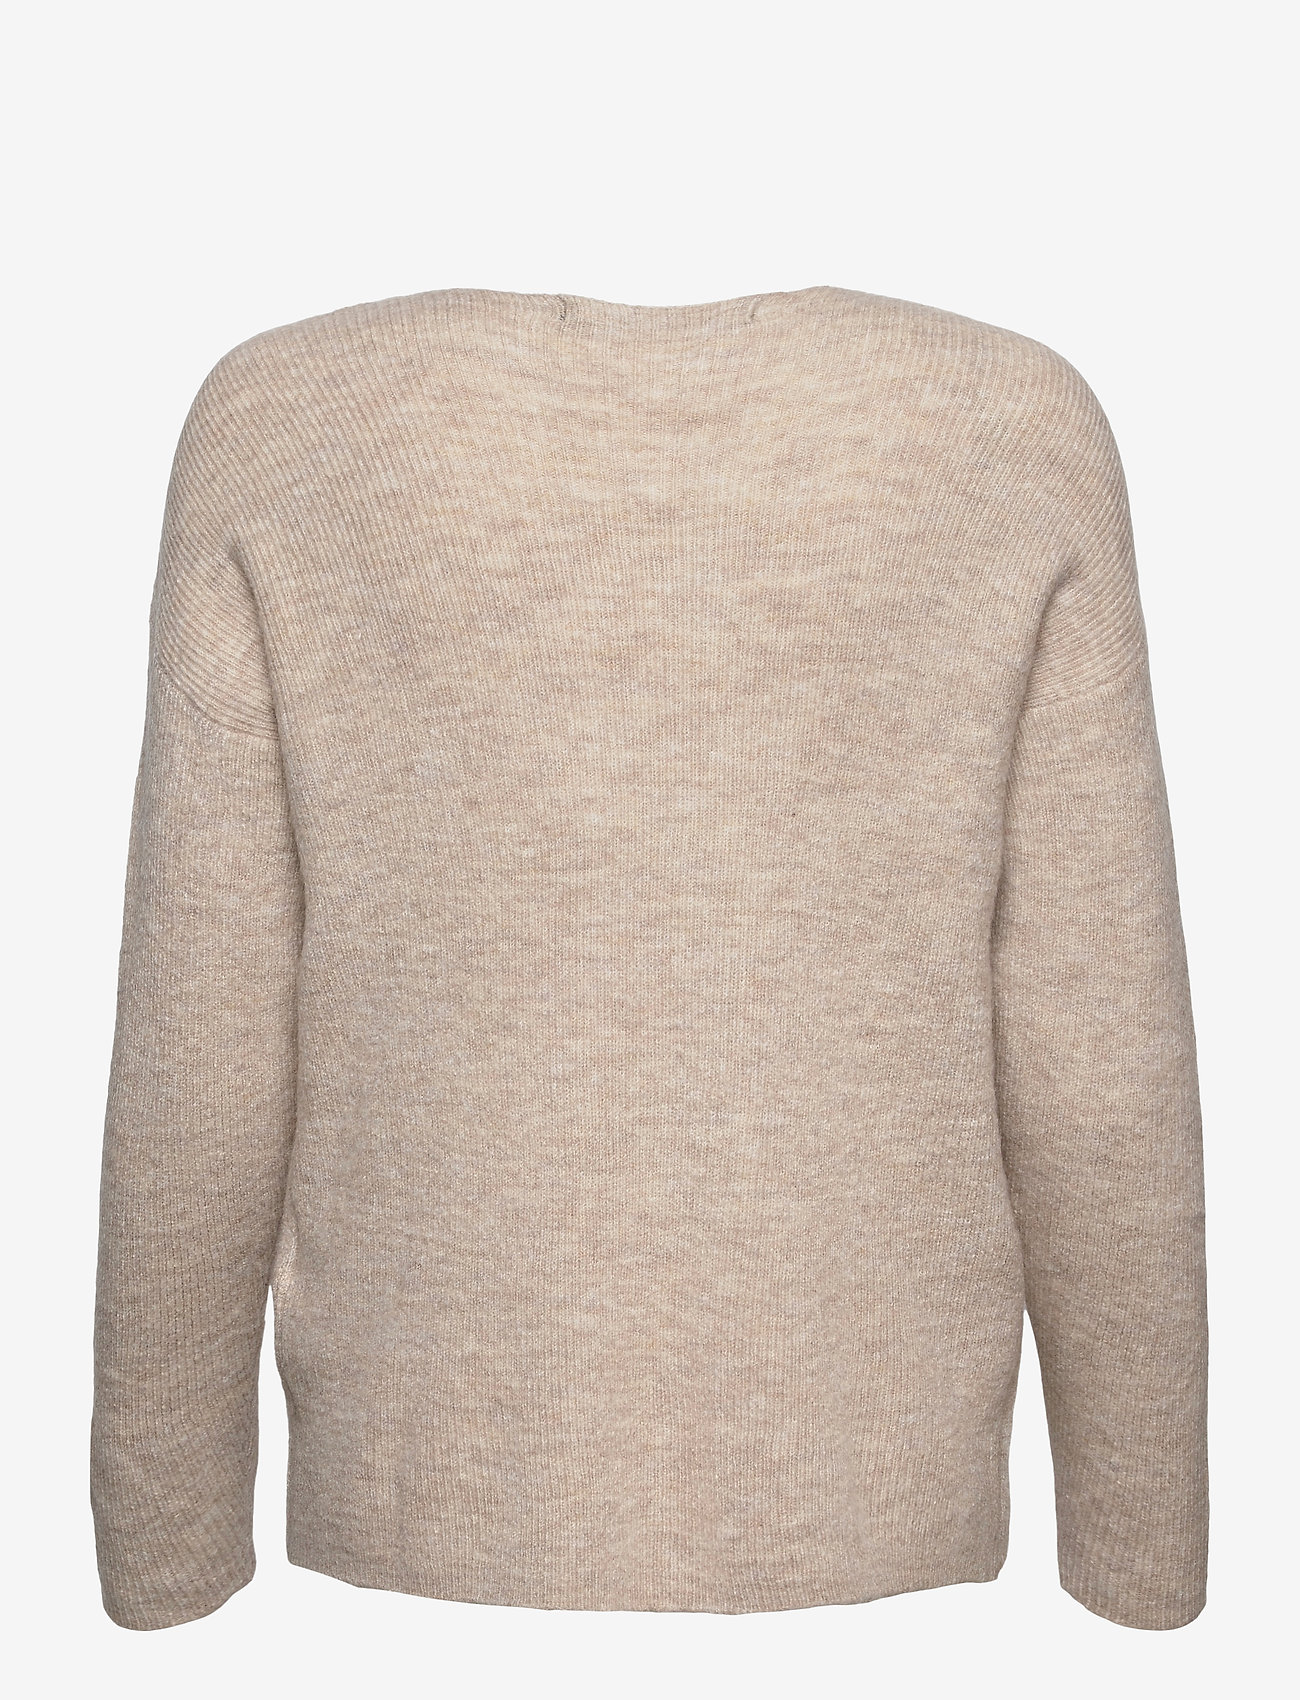 Vero Moda - VMCREWLEFILE LS V-NECK BLOUSE - tröjor - birch - 1